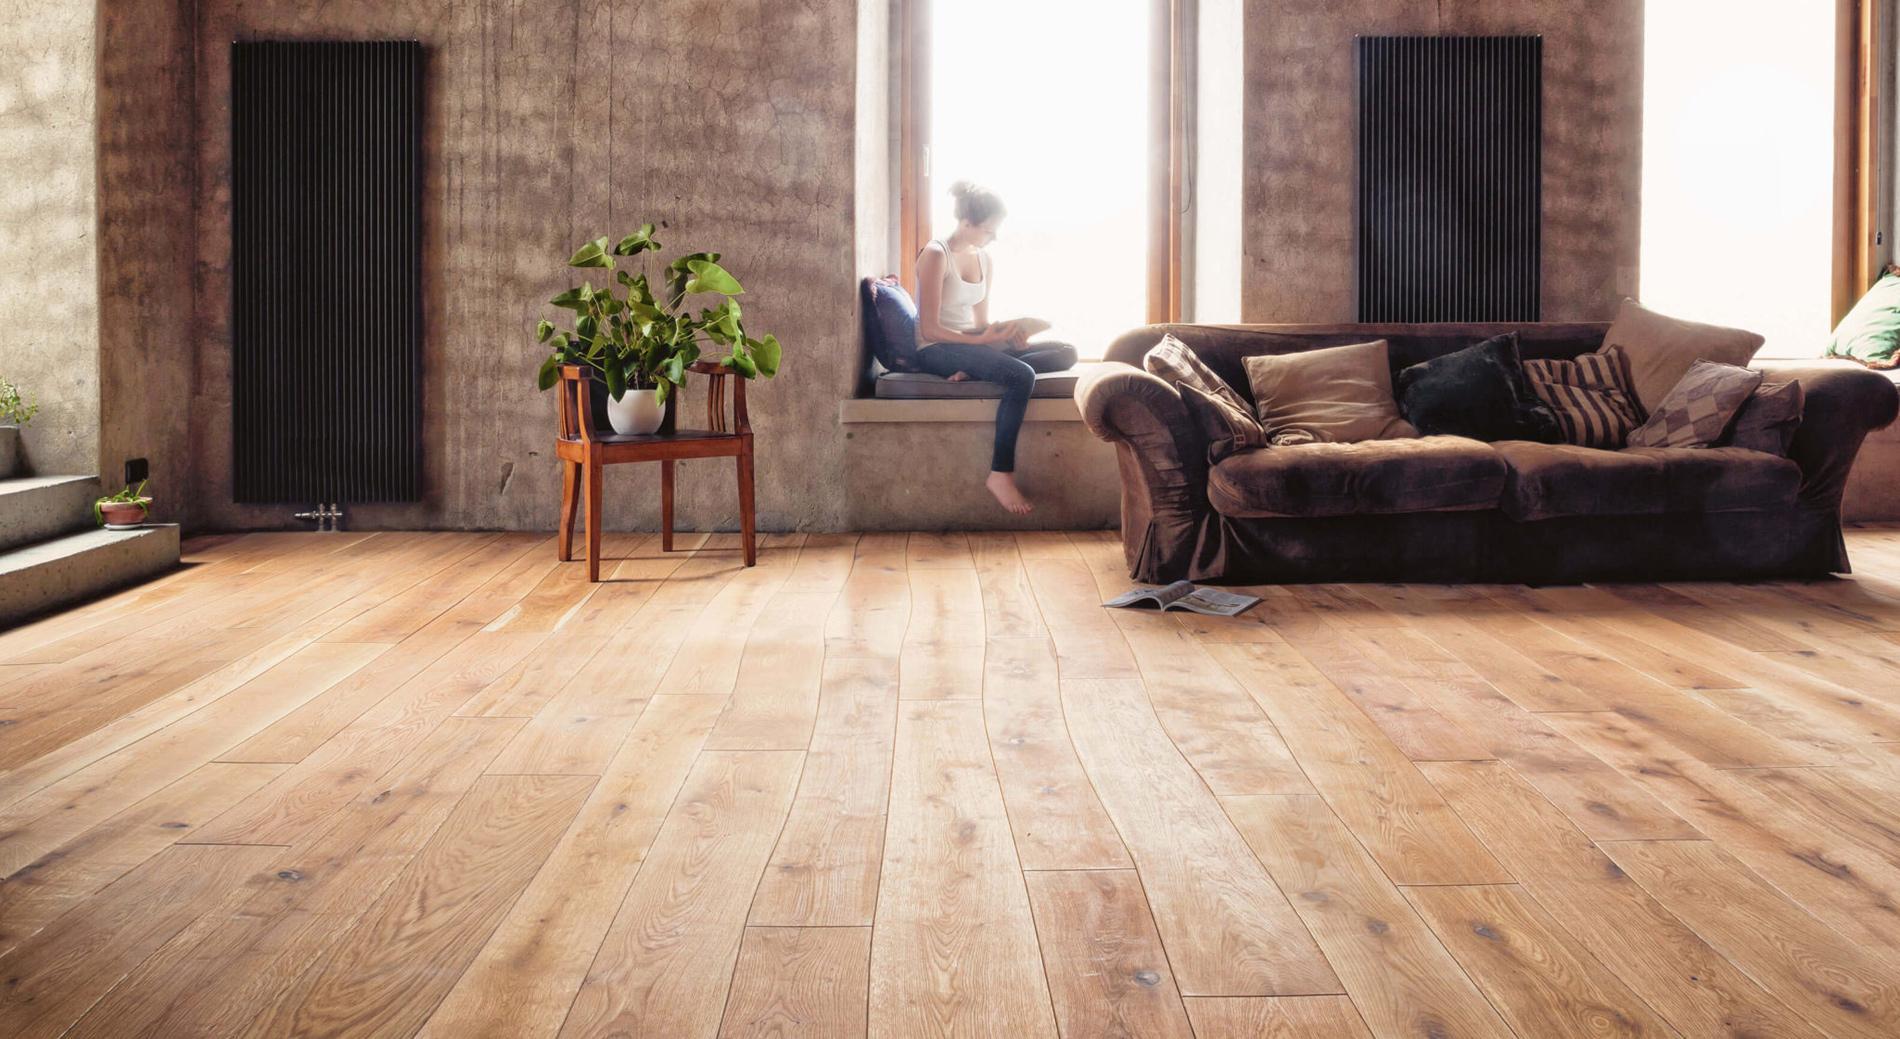 comment twister son parquet madame figaro. Black Bedroom Furniture Sets. Home Design Ideas